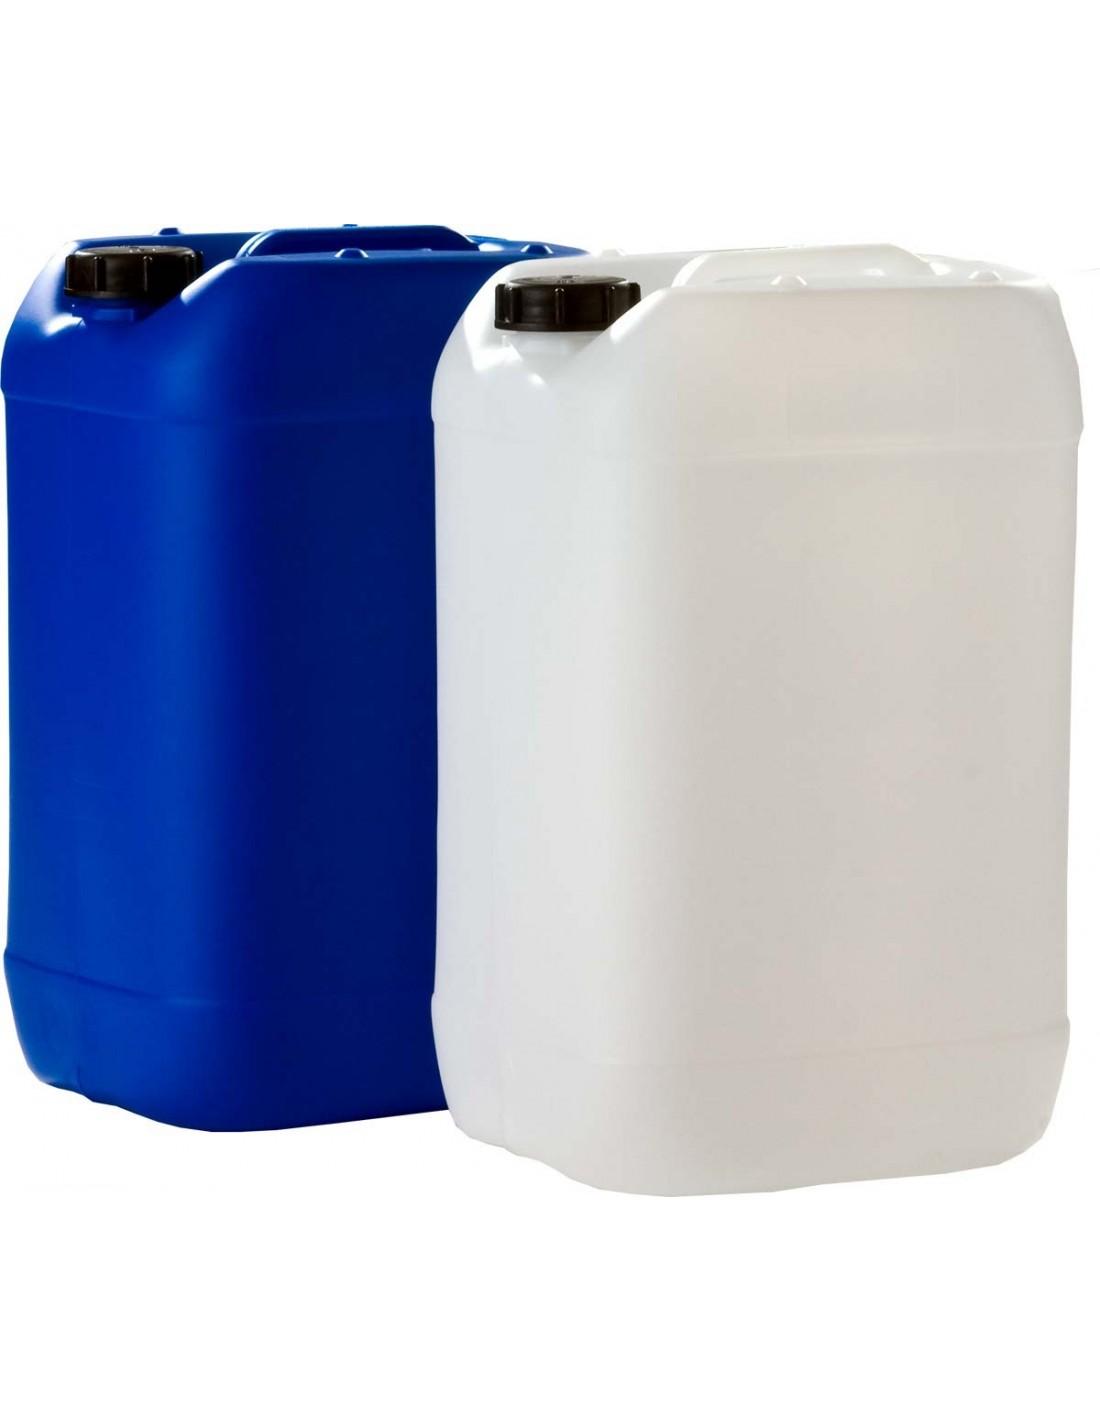 25 Liter Kanister UN-Y,  inkl. Normal-Verschluss